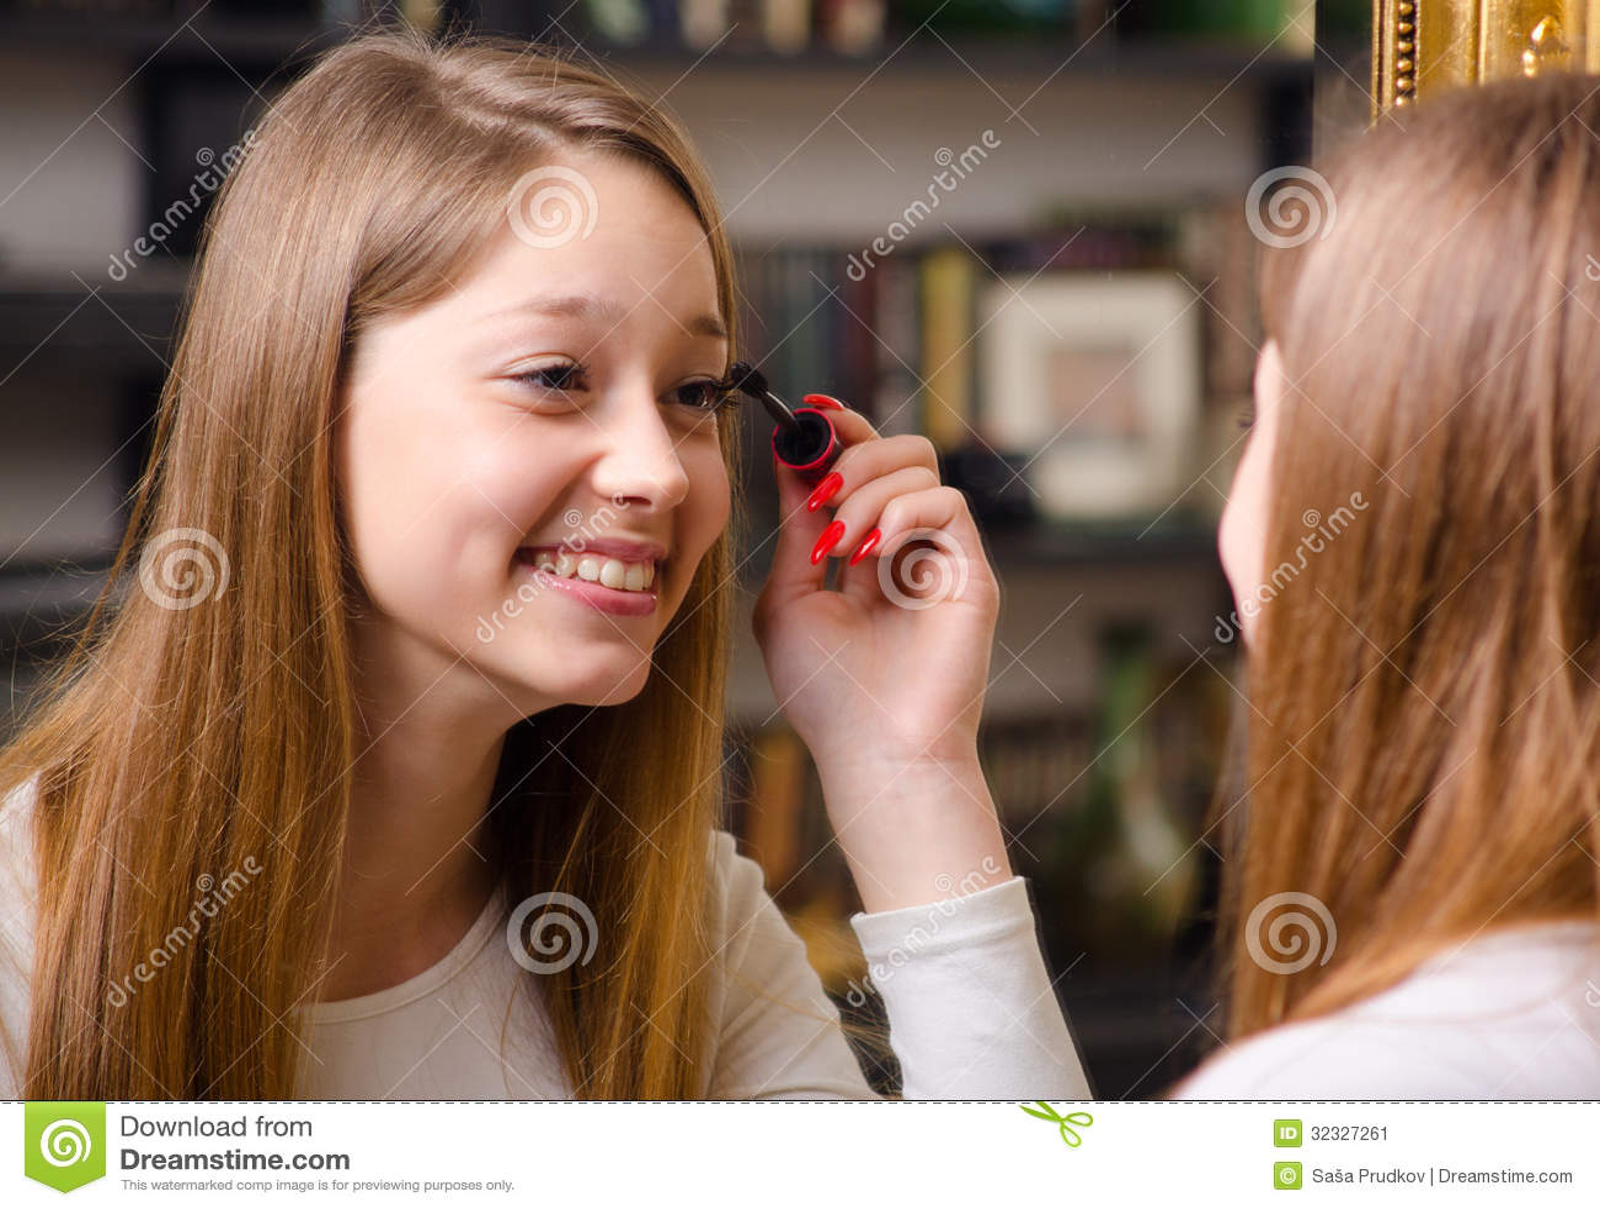 teen girls having squirting orgasm